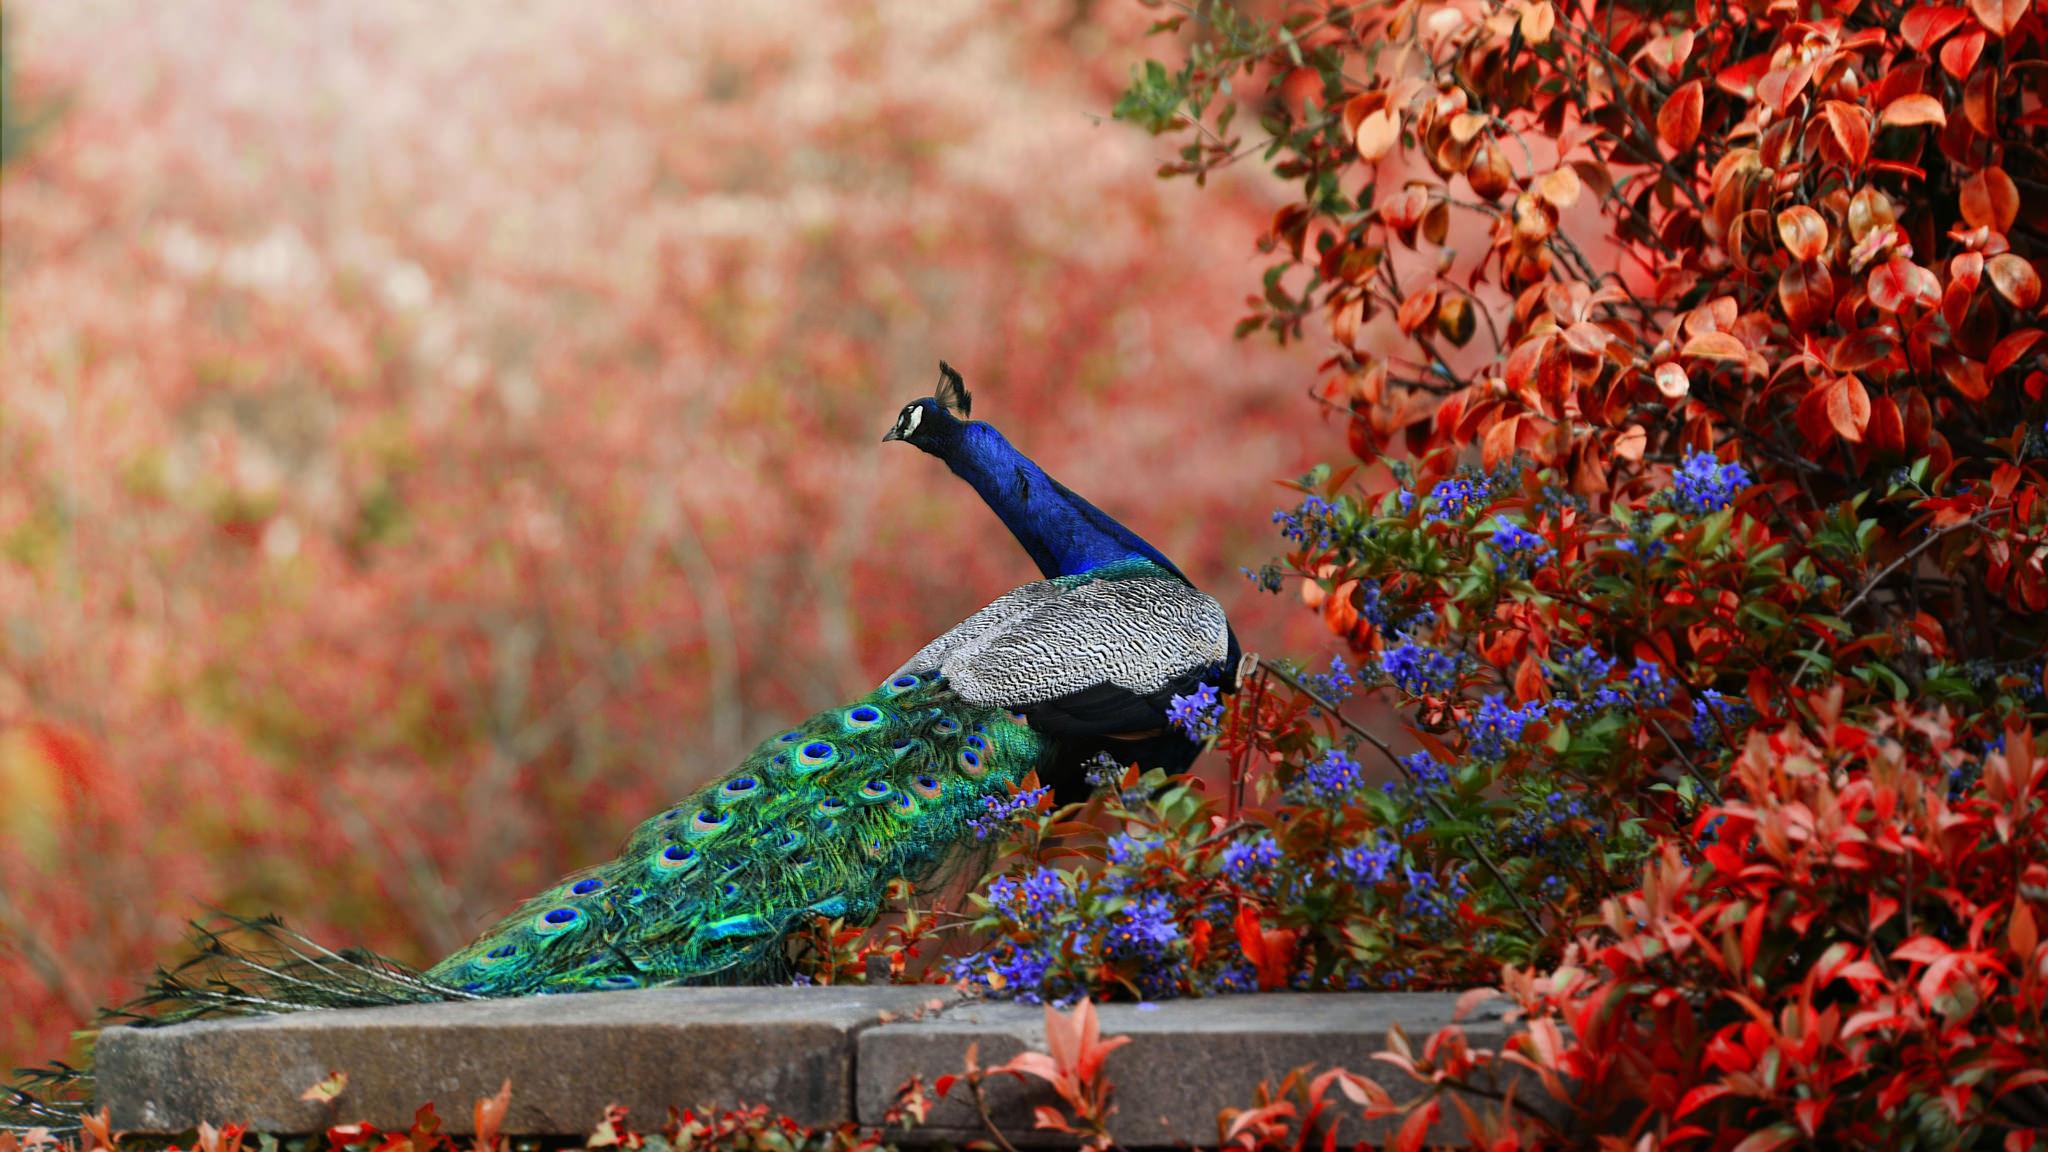 Peacock HD Wallpaper